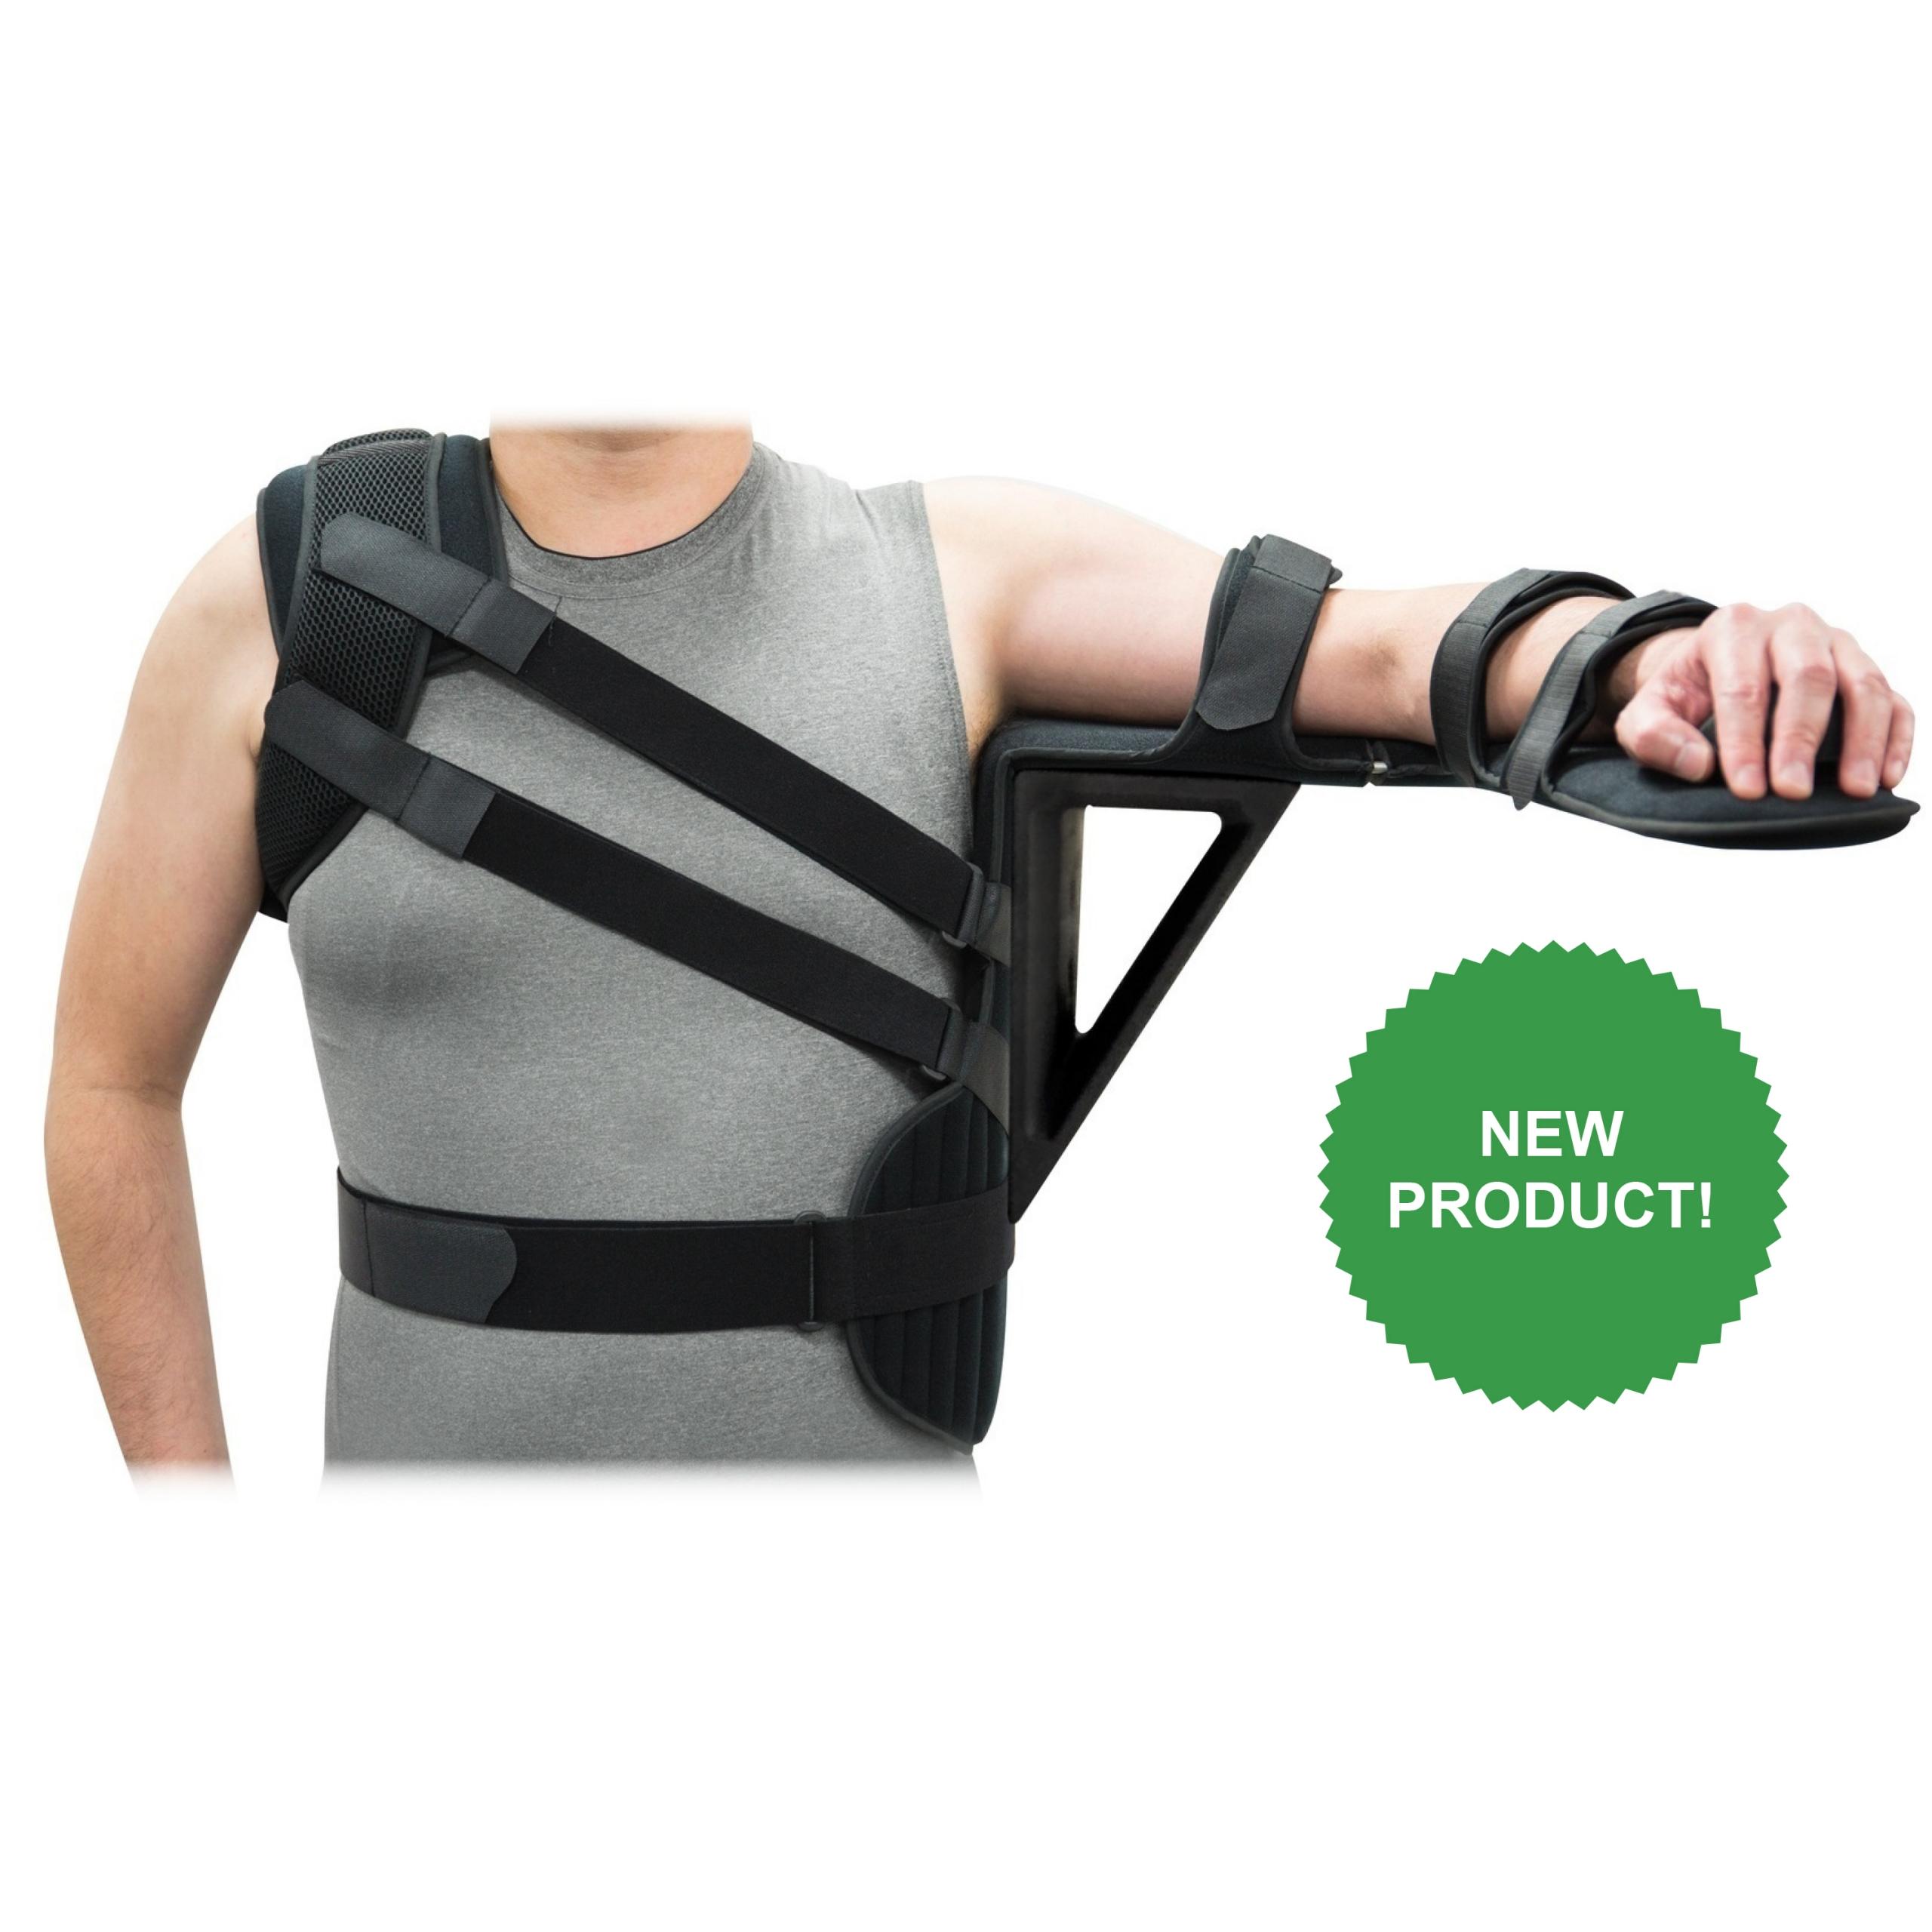 Deluxe Shoulder Abduction System